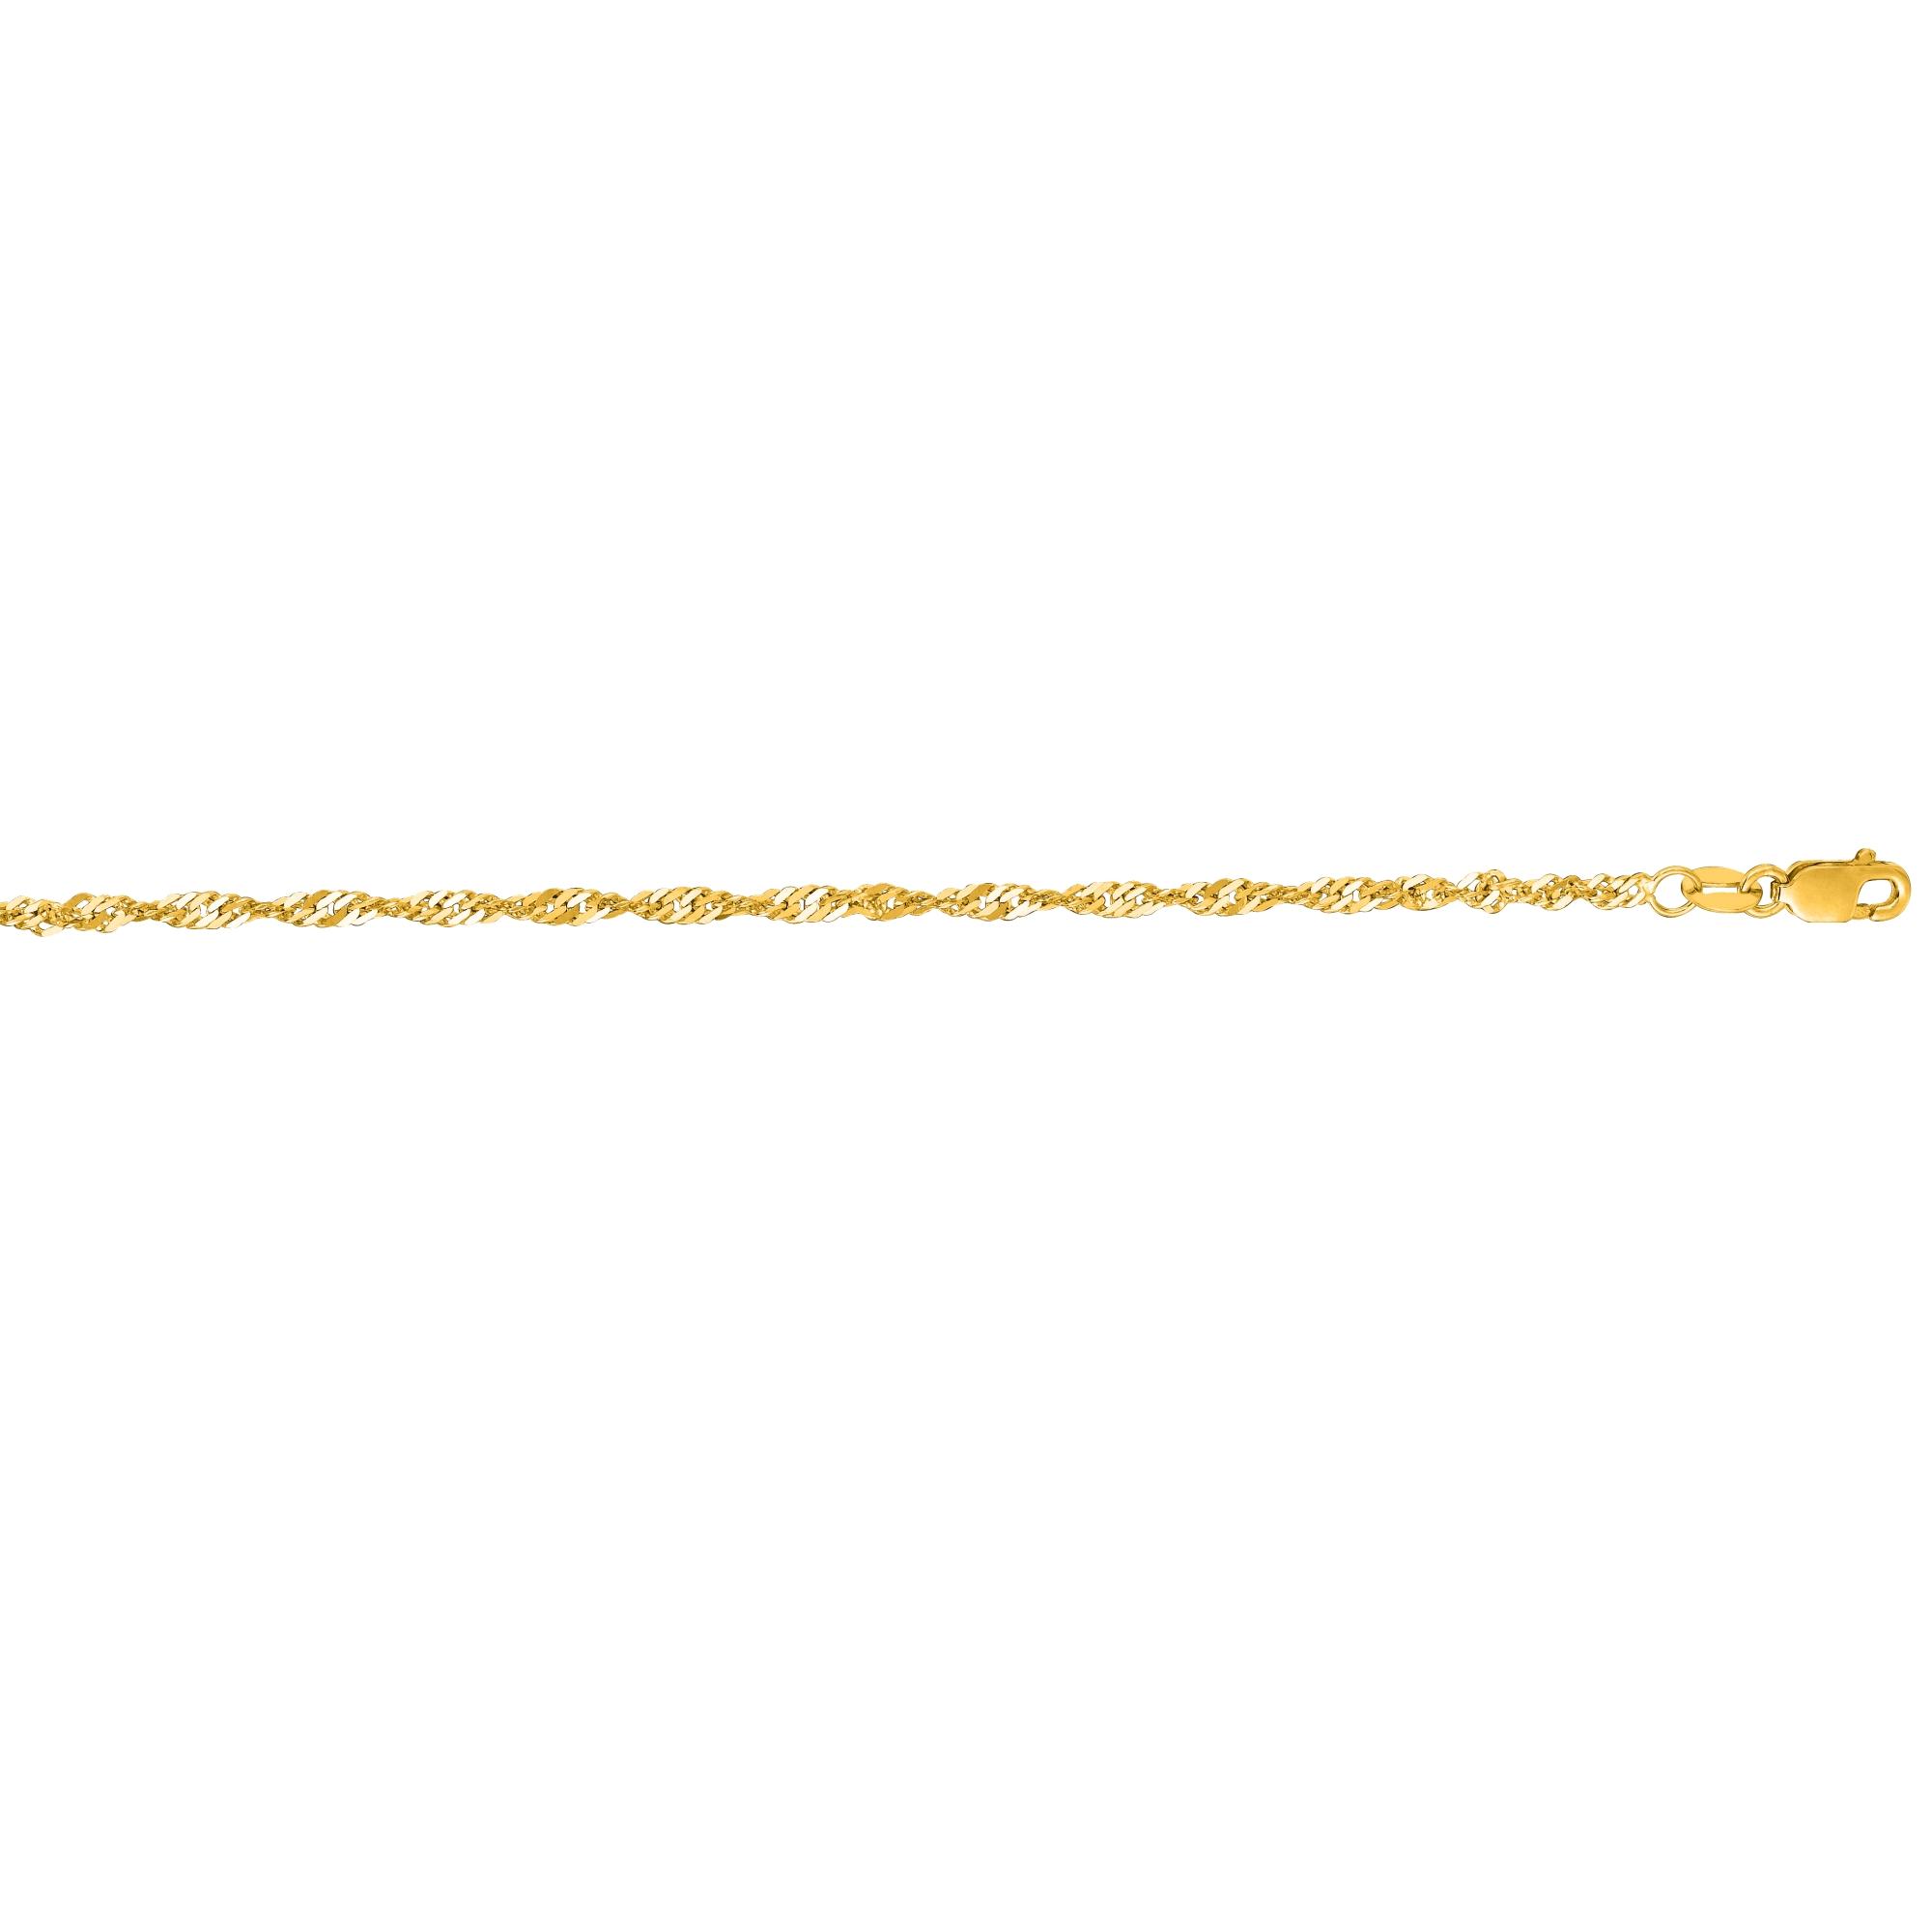 LUXURMAN Solid 14k Gold Singapore Chain For Men & Women 1.7mm Wide